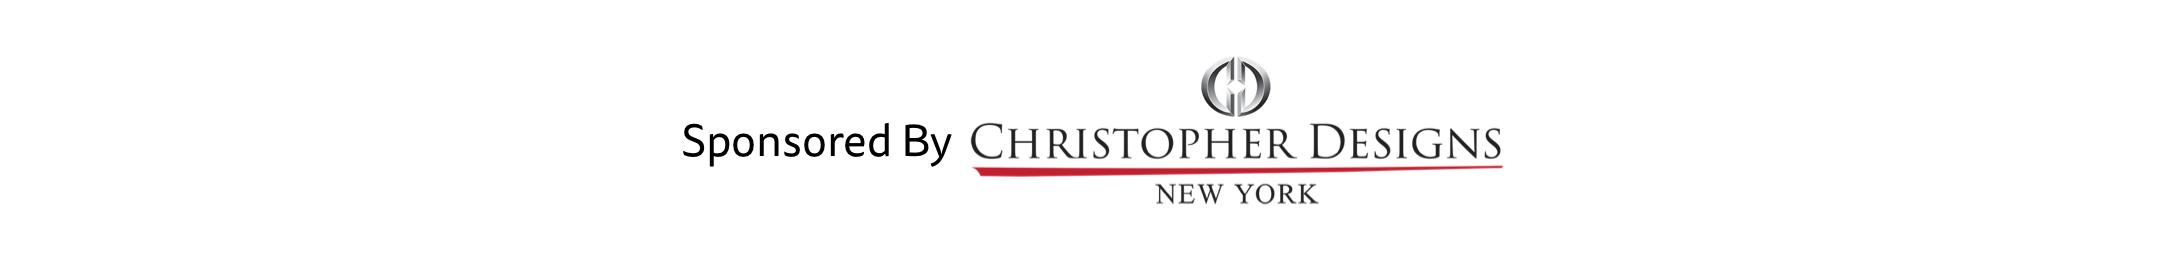 christopher designs header